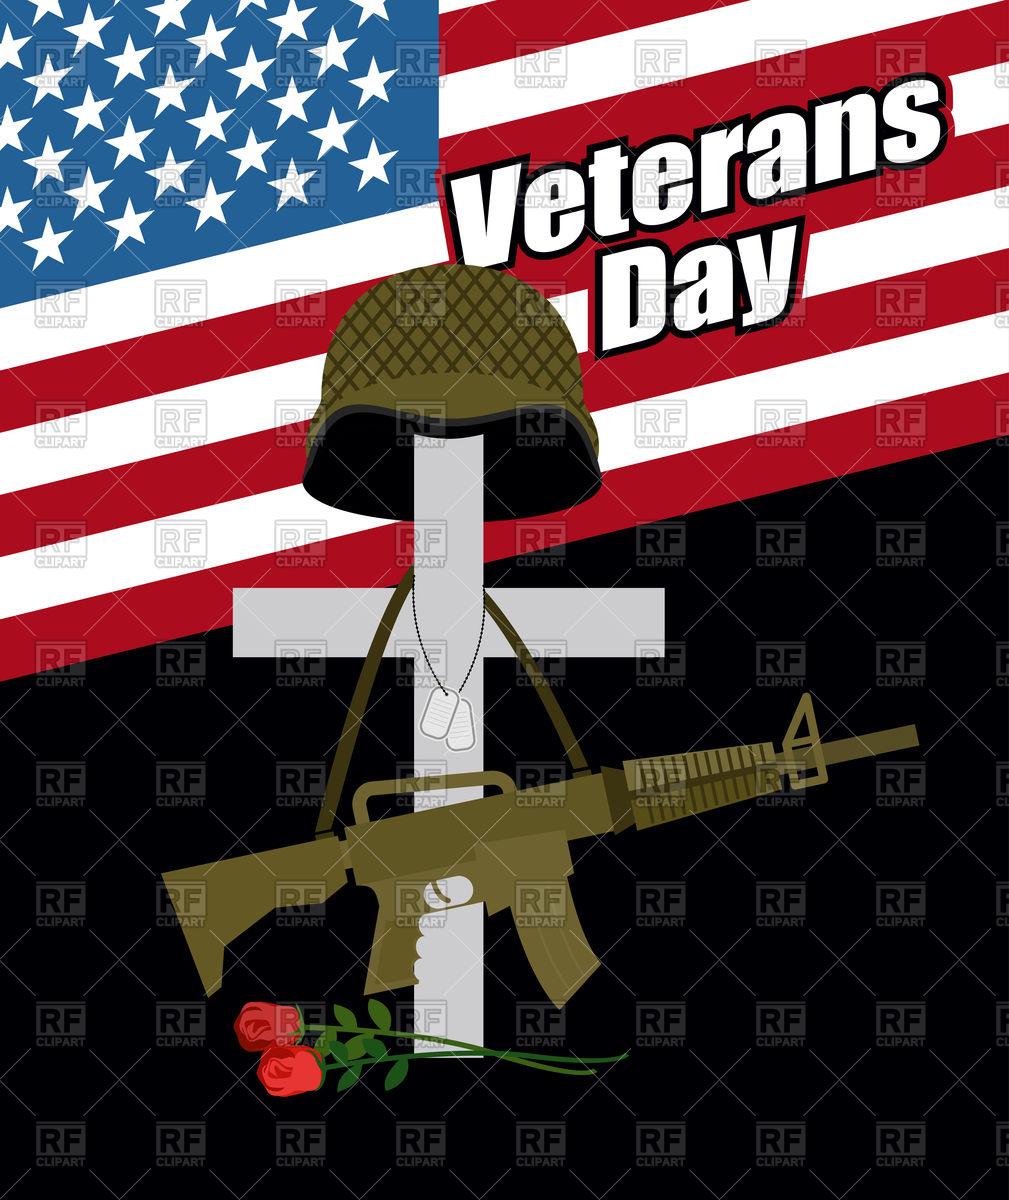 1009x1200 Veterans Day Vector Art Amp Illustrations Vector Graphics Rfclipart